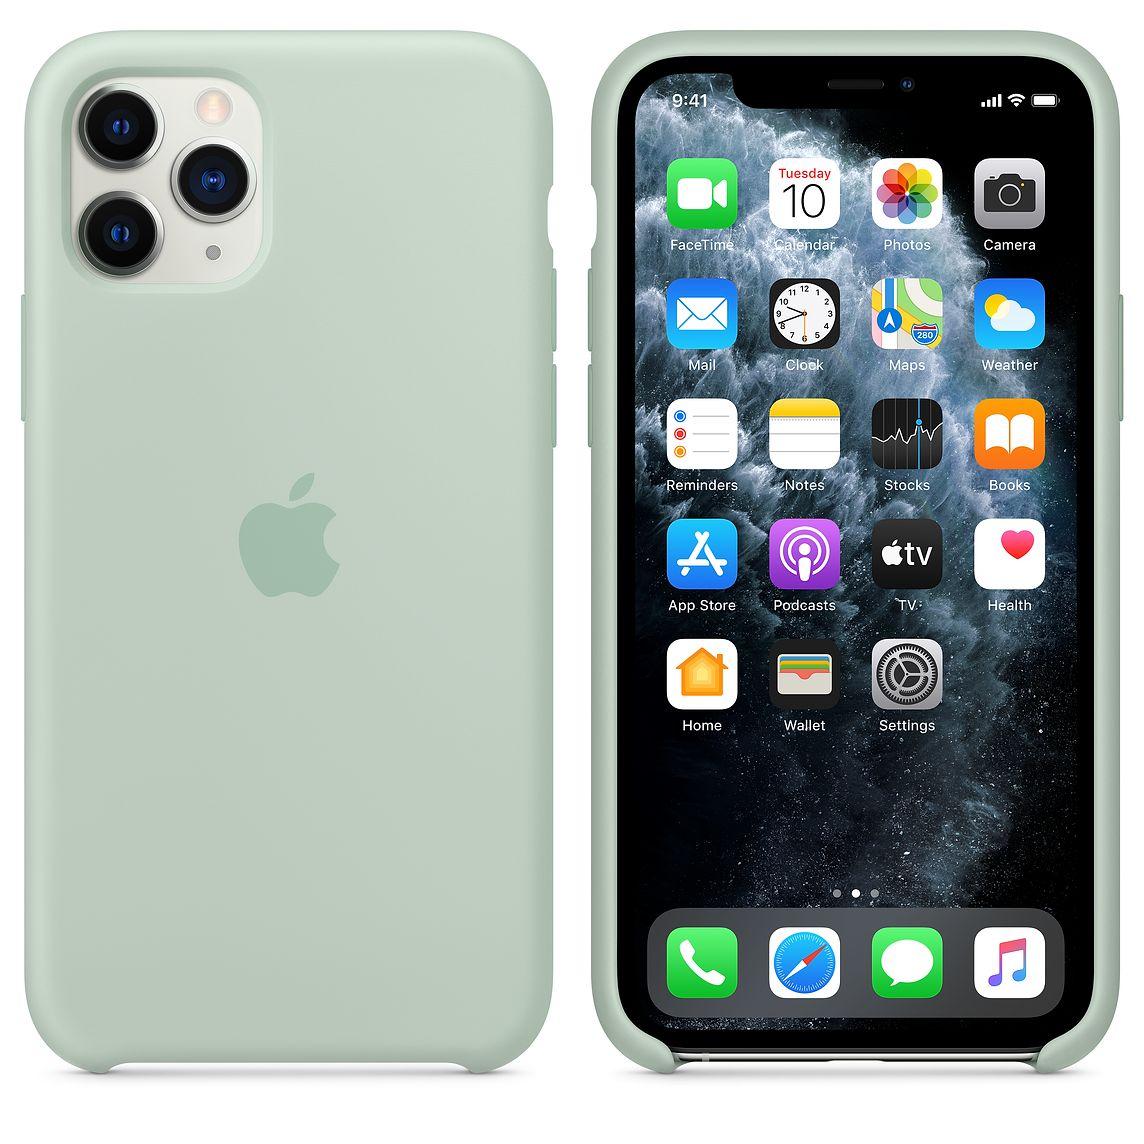 iPhone 官方硅胶保护壳为什么这么贵?有哪些特点?